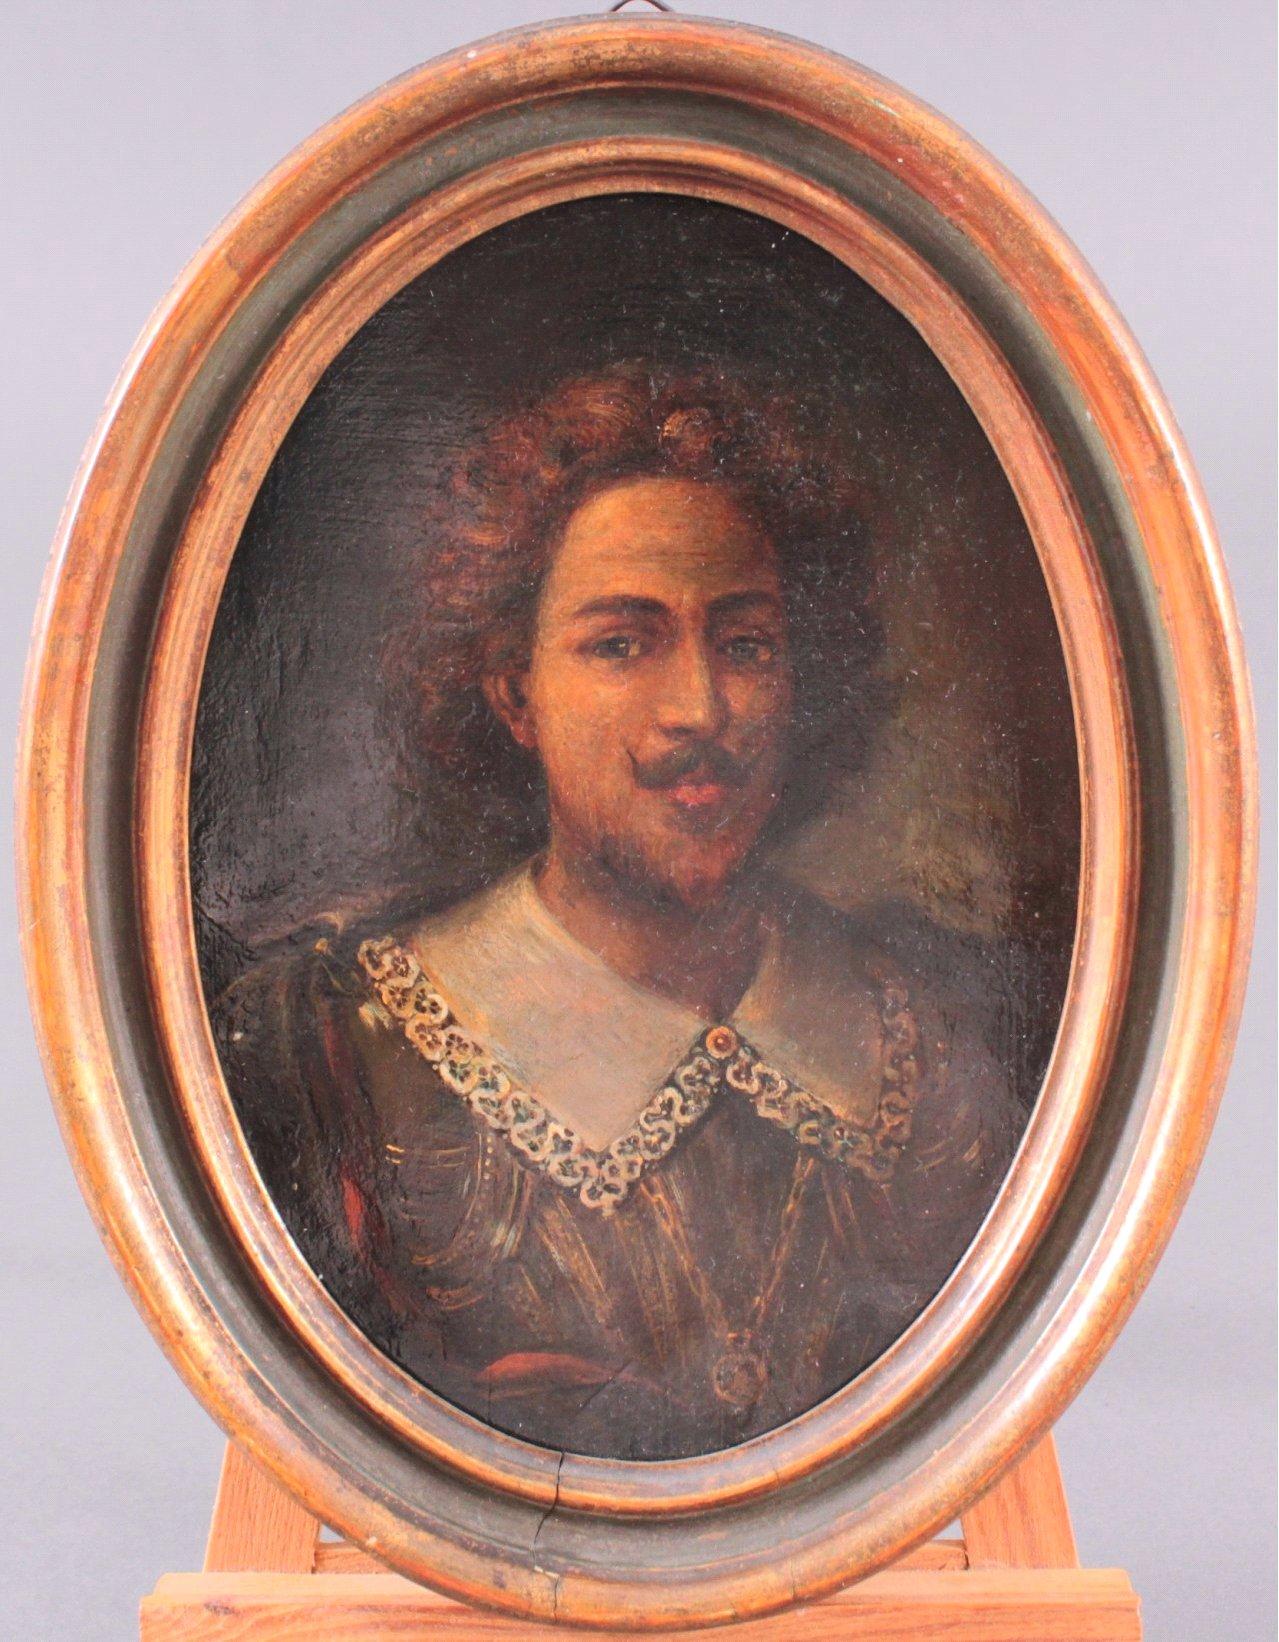 Wohl Diego Velázques Portrait, 18. Jahrhundert